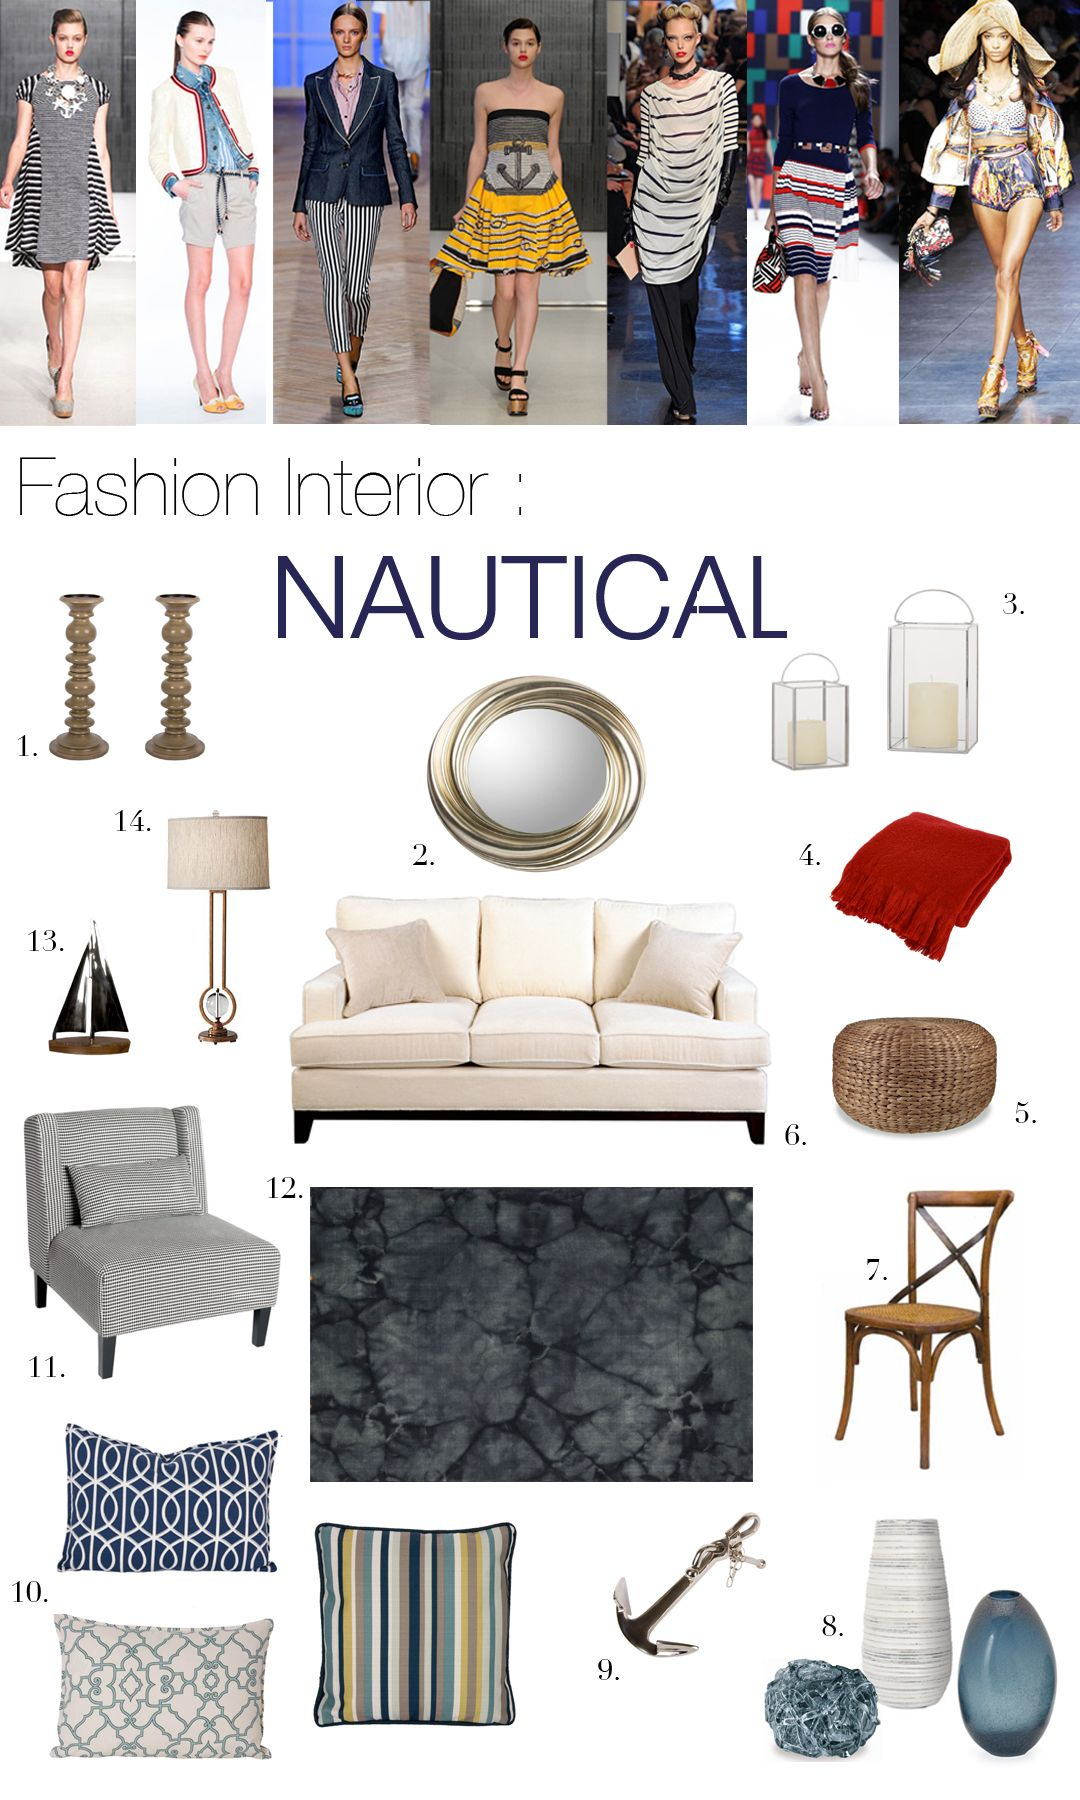 Fashion Interior : Nautical | Benjamin moore paint colours, Benjamin ...